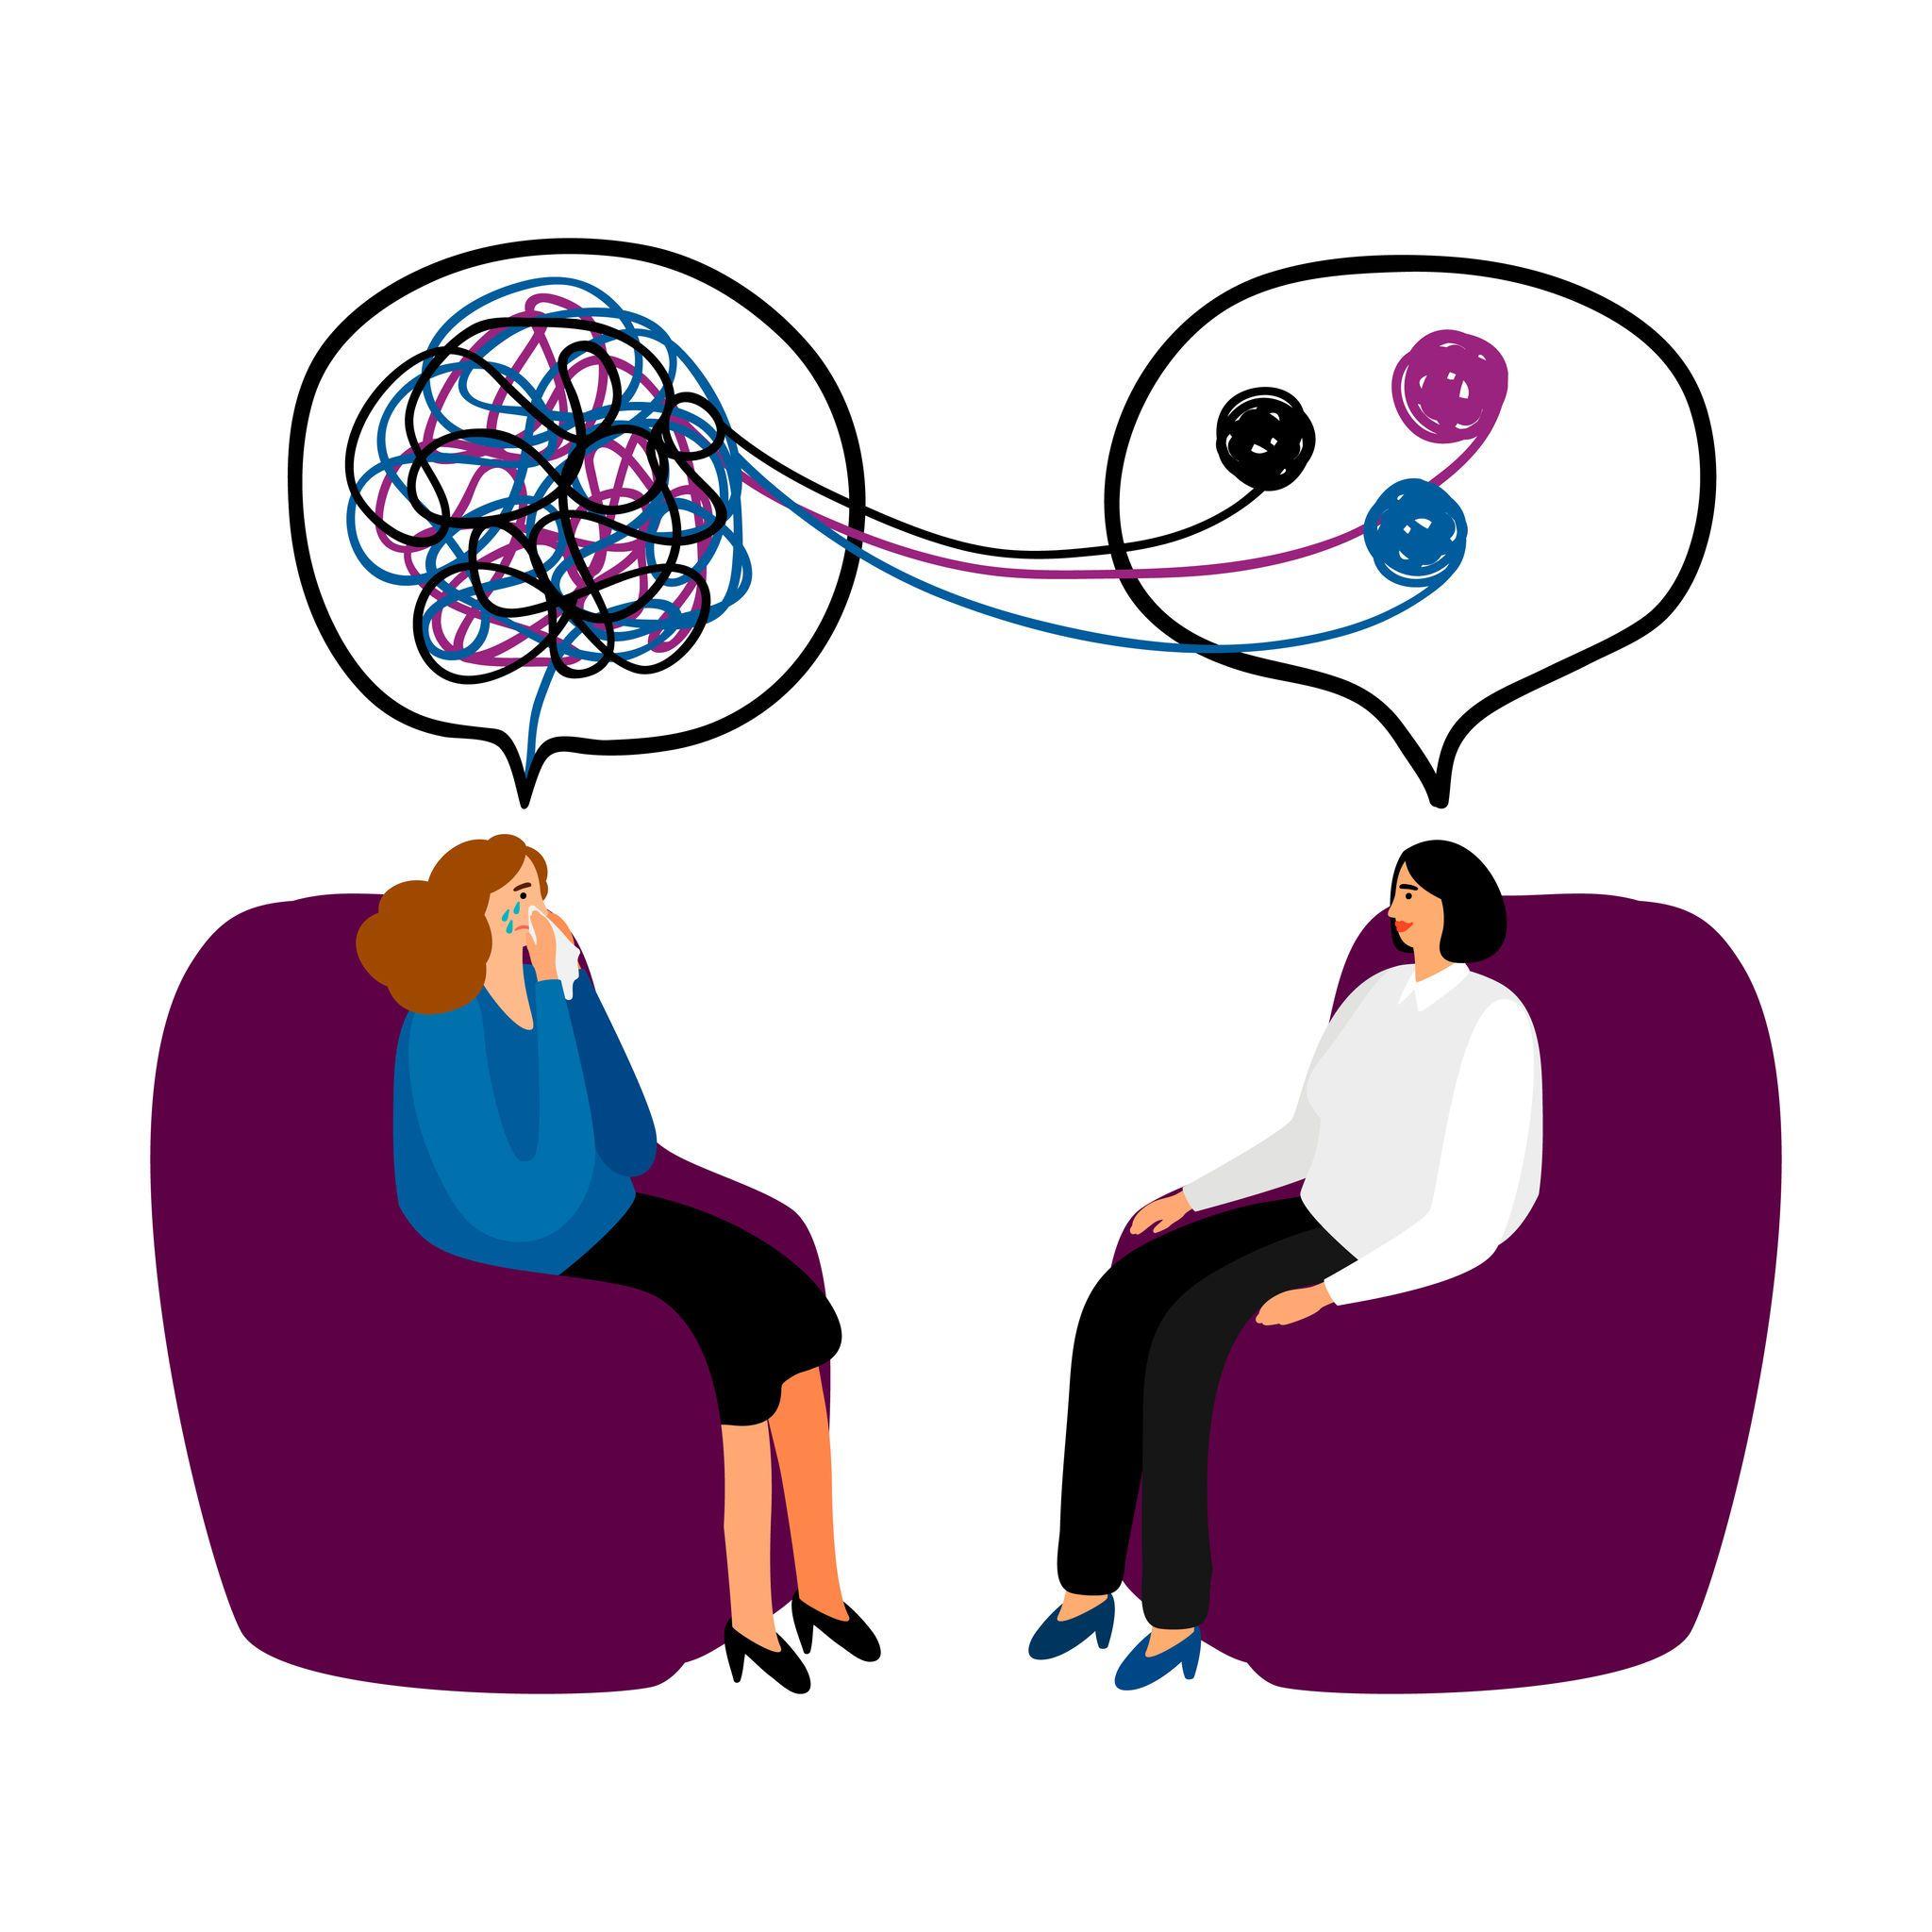 Conexus Atenció Psicoterapia